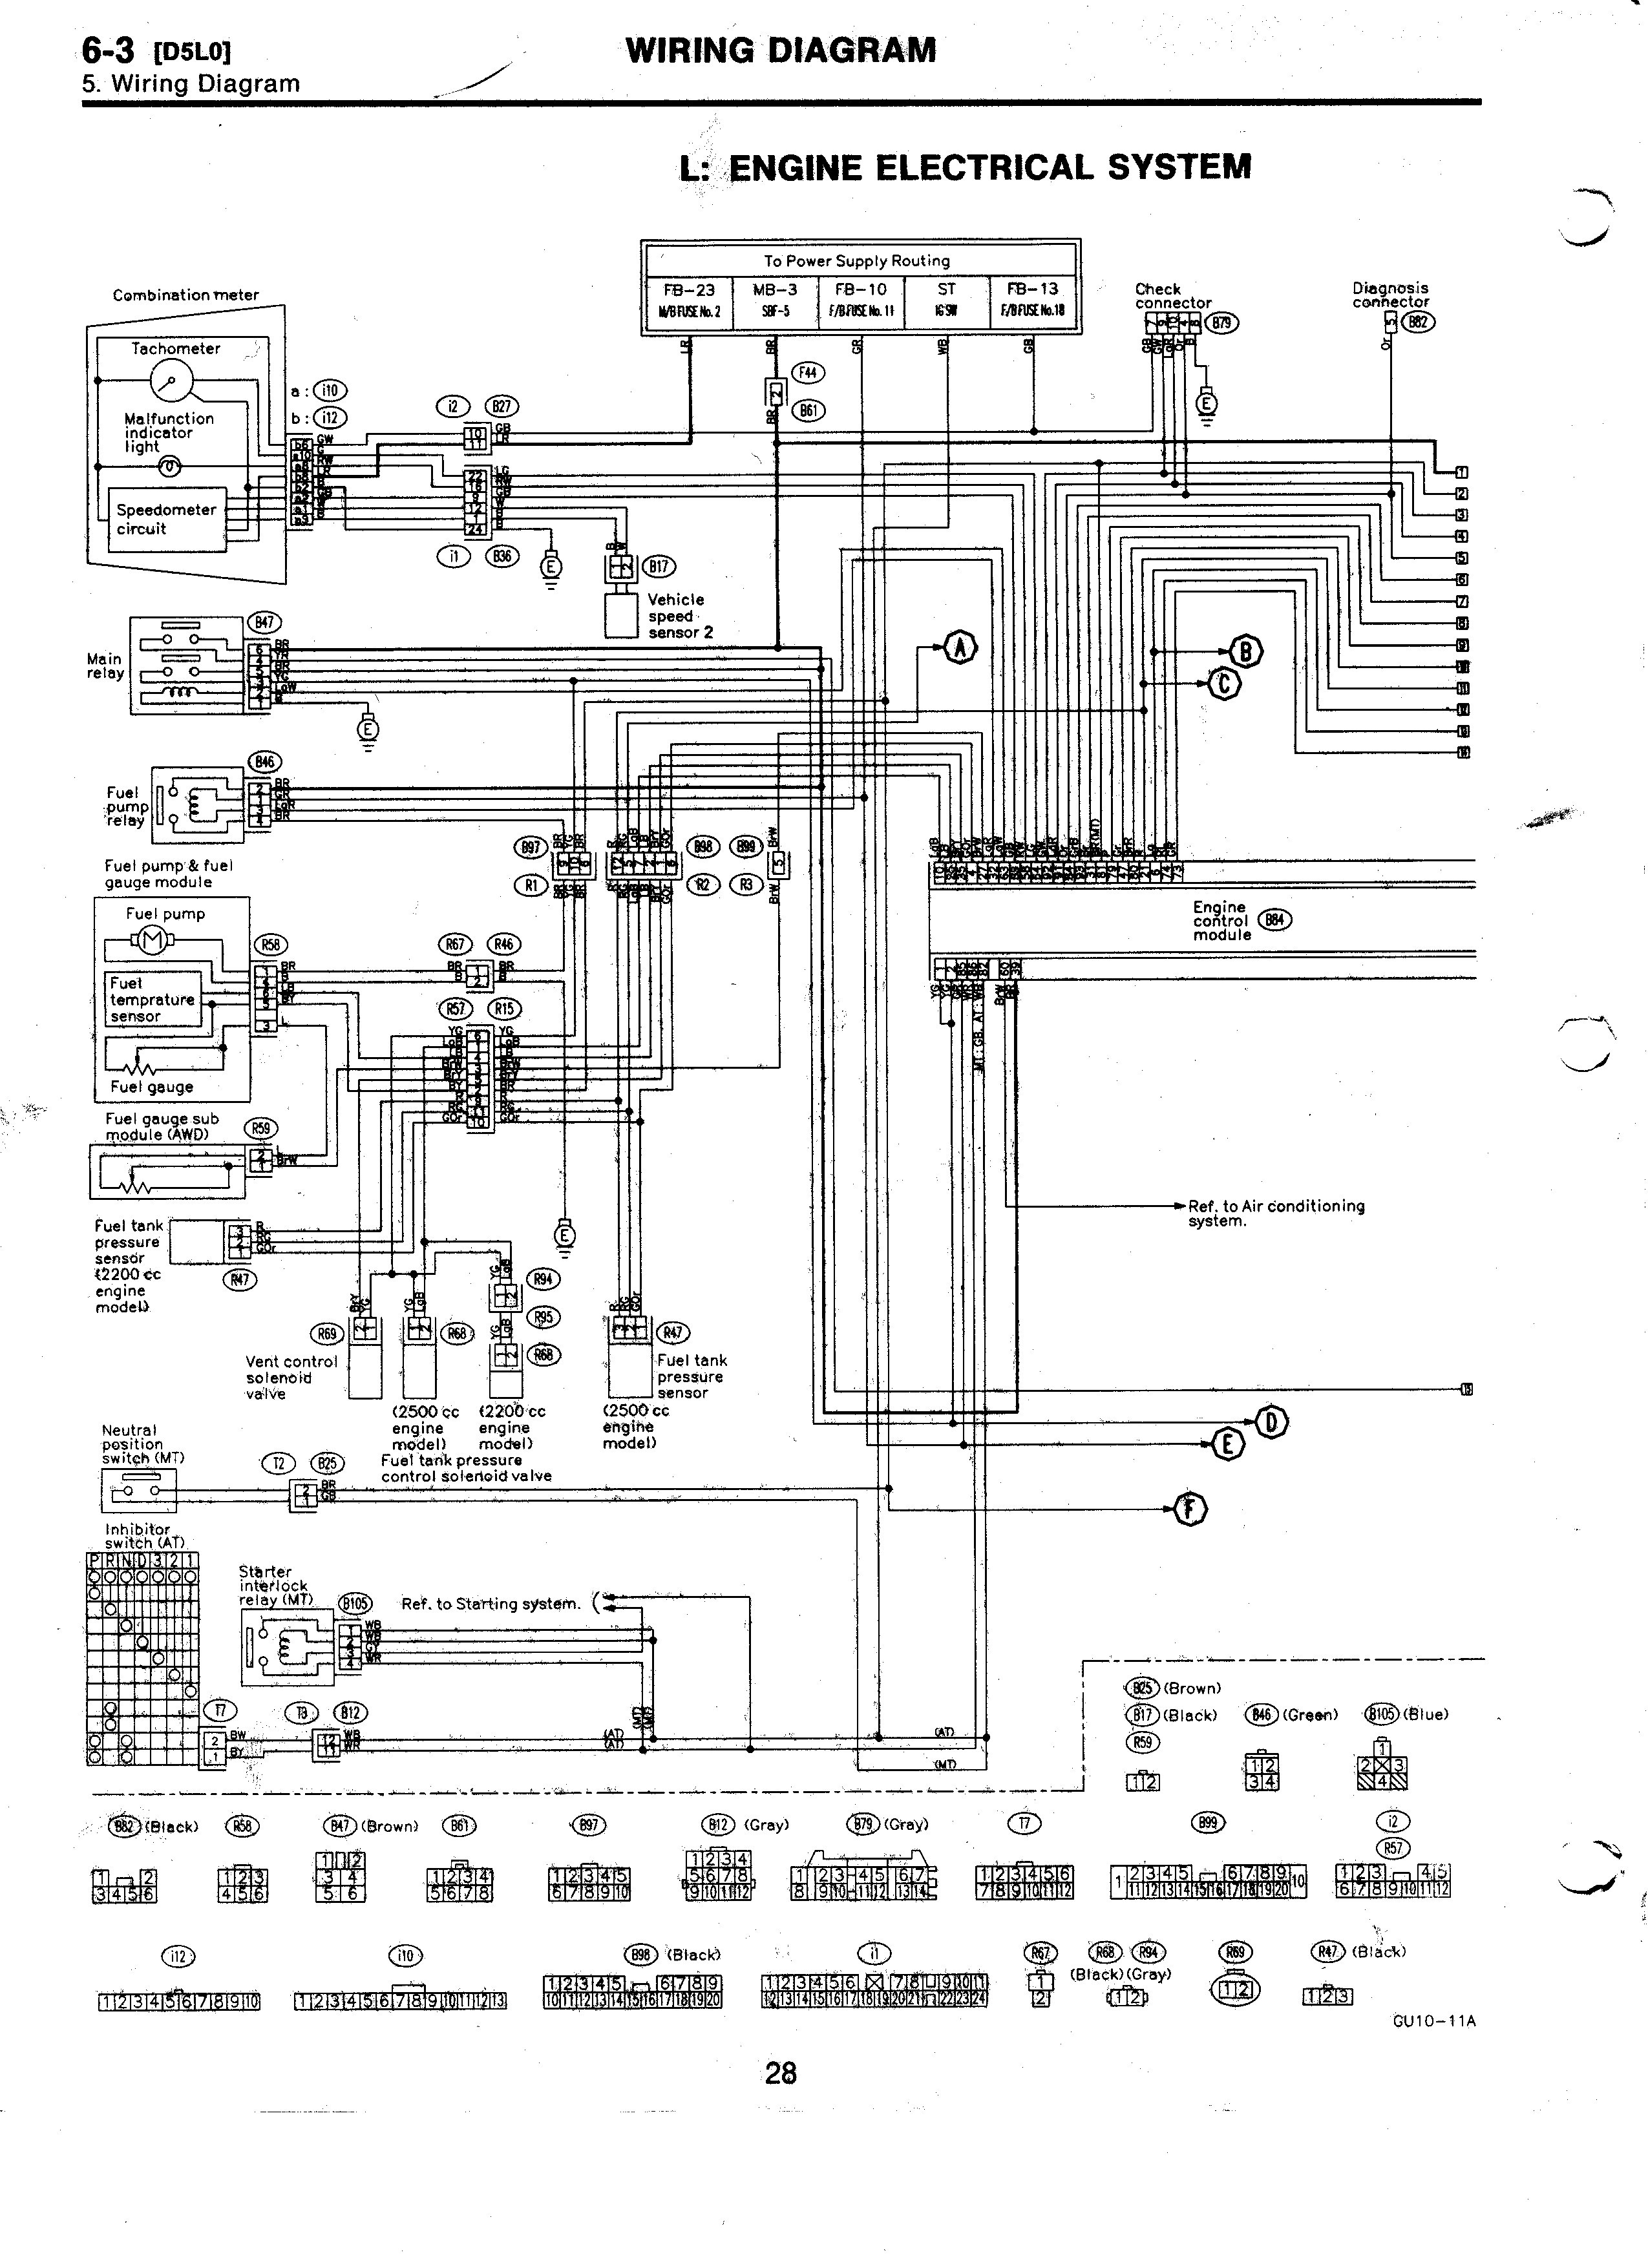 Subaru Legacy Engine Diagram 2 Impreza Horn Wiring Diagram Best 1998 Subaru Legacy Alternator Of Subaru Legacy Engine Diagram 2